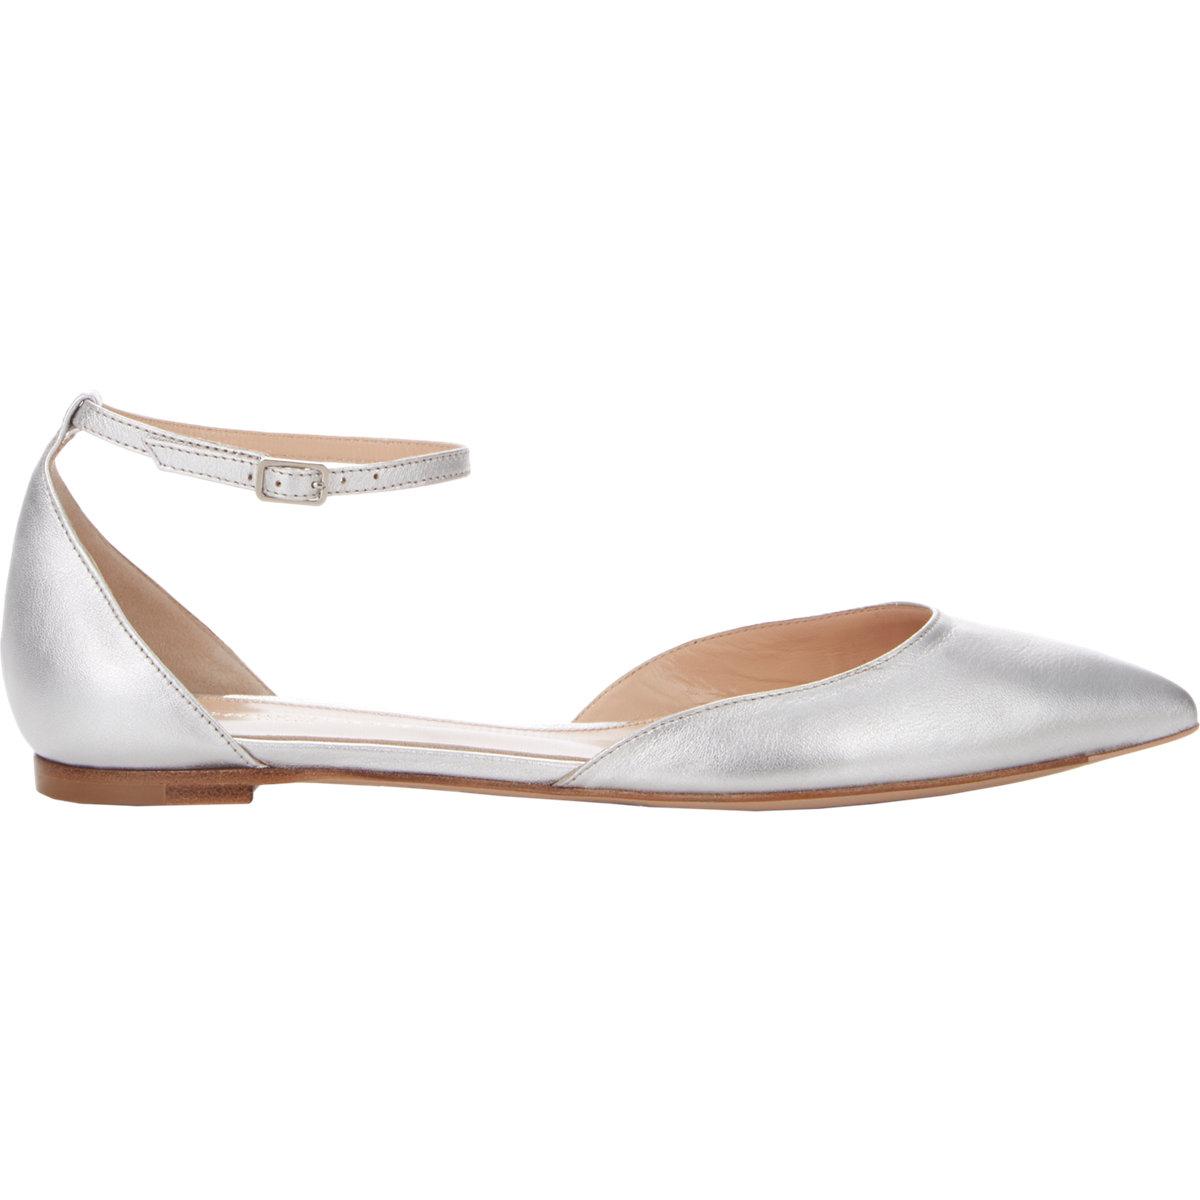 5c15b5b36cf1 Lyst - Gianvito Rossi Women s Ankle-strap D orsay Flats in Metallic